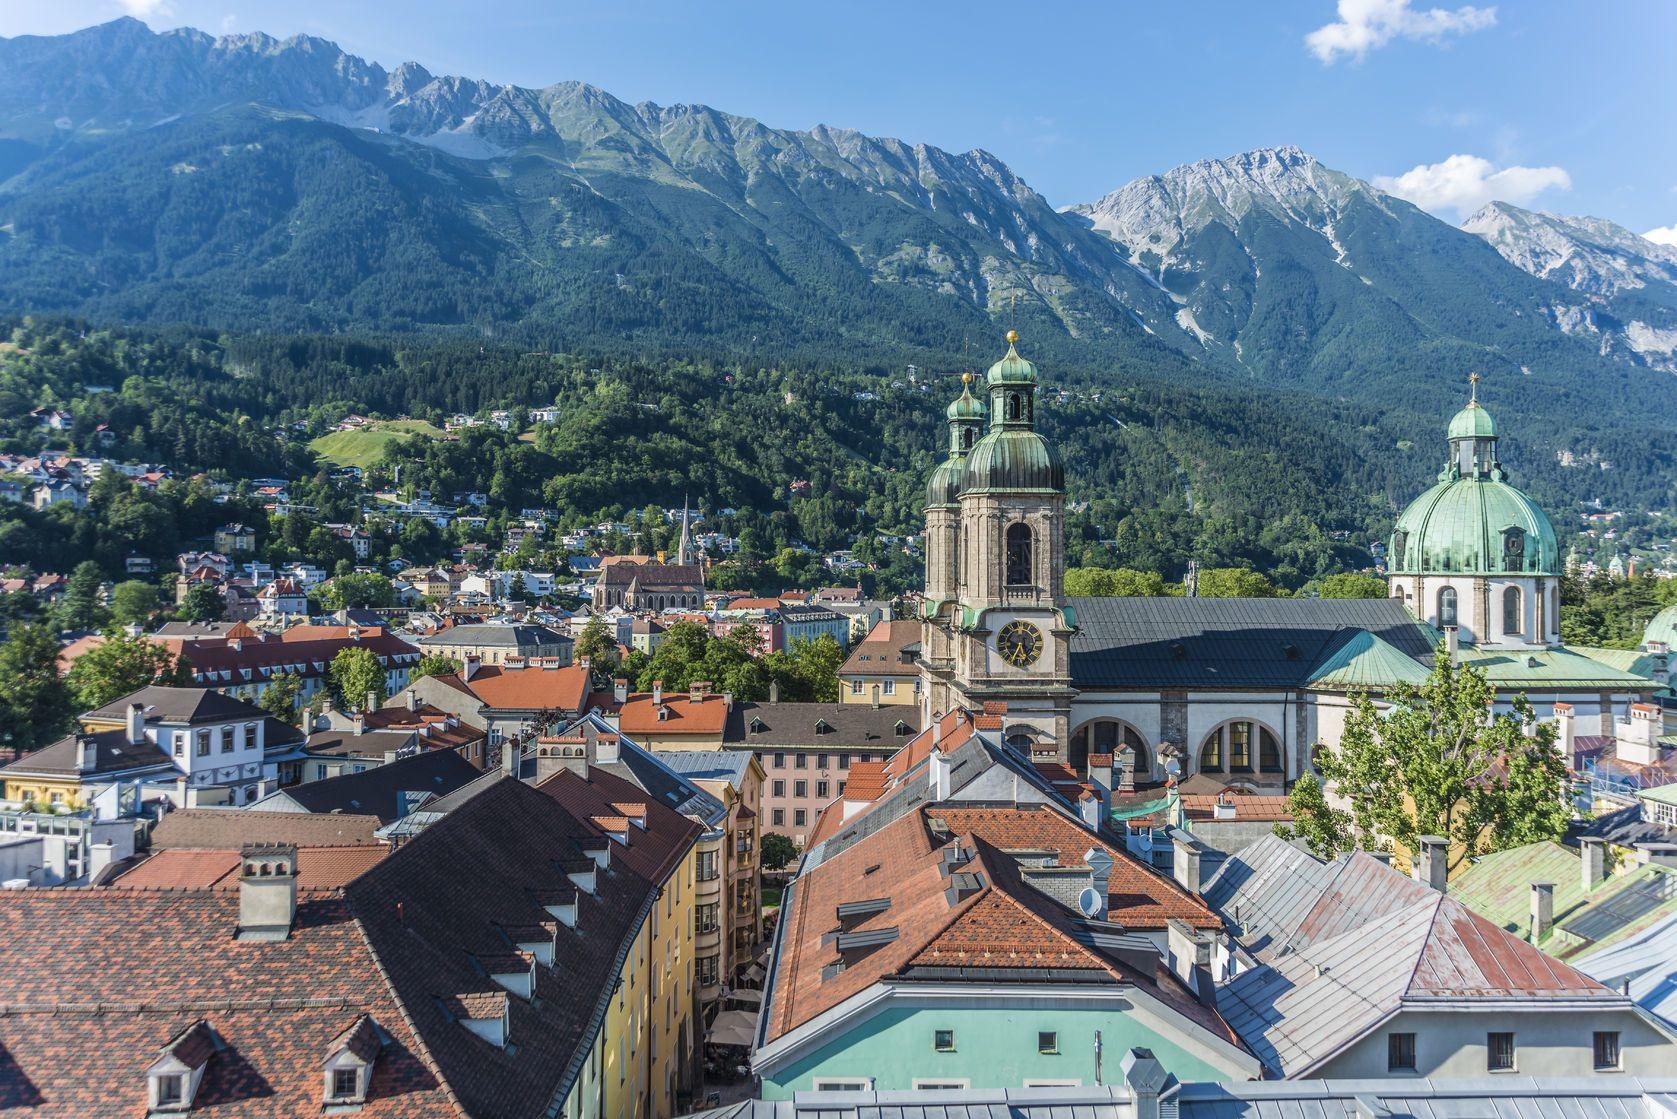 Pohled na Innsbruck v Rakousku   anibaltrejo/123RF.com